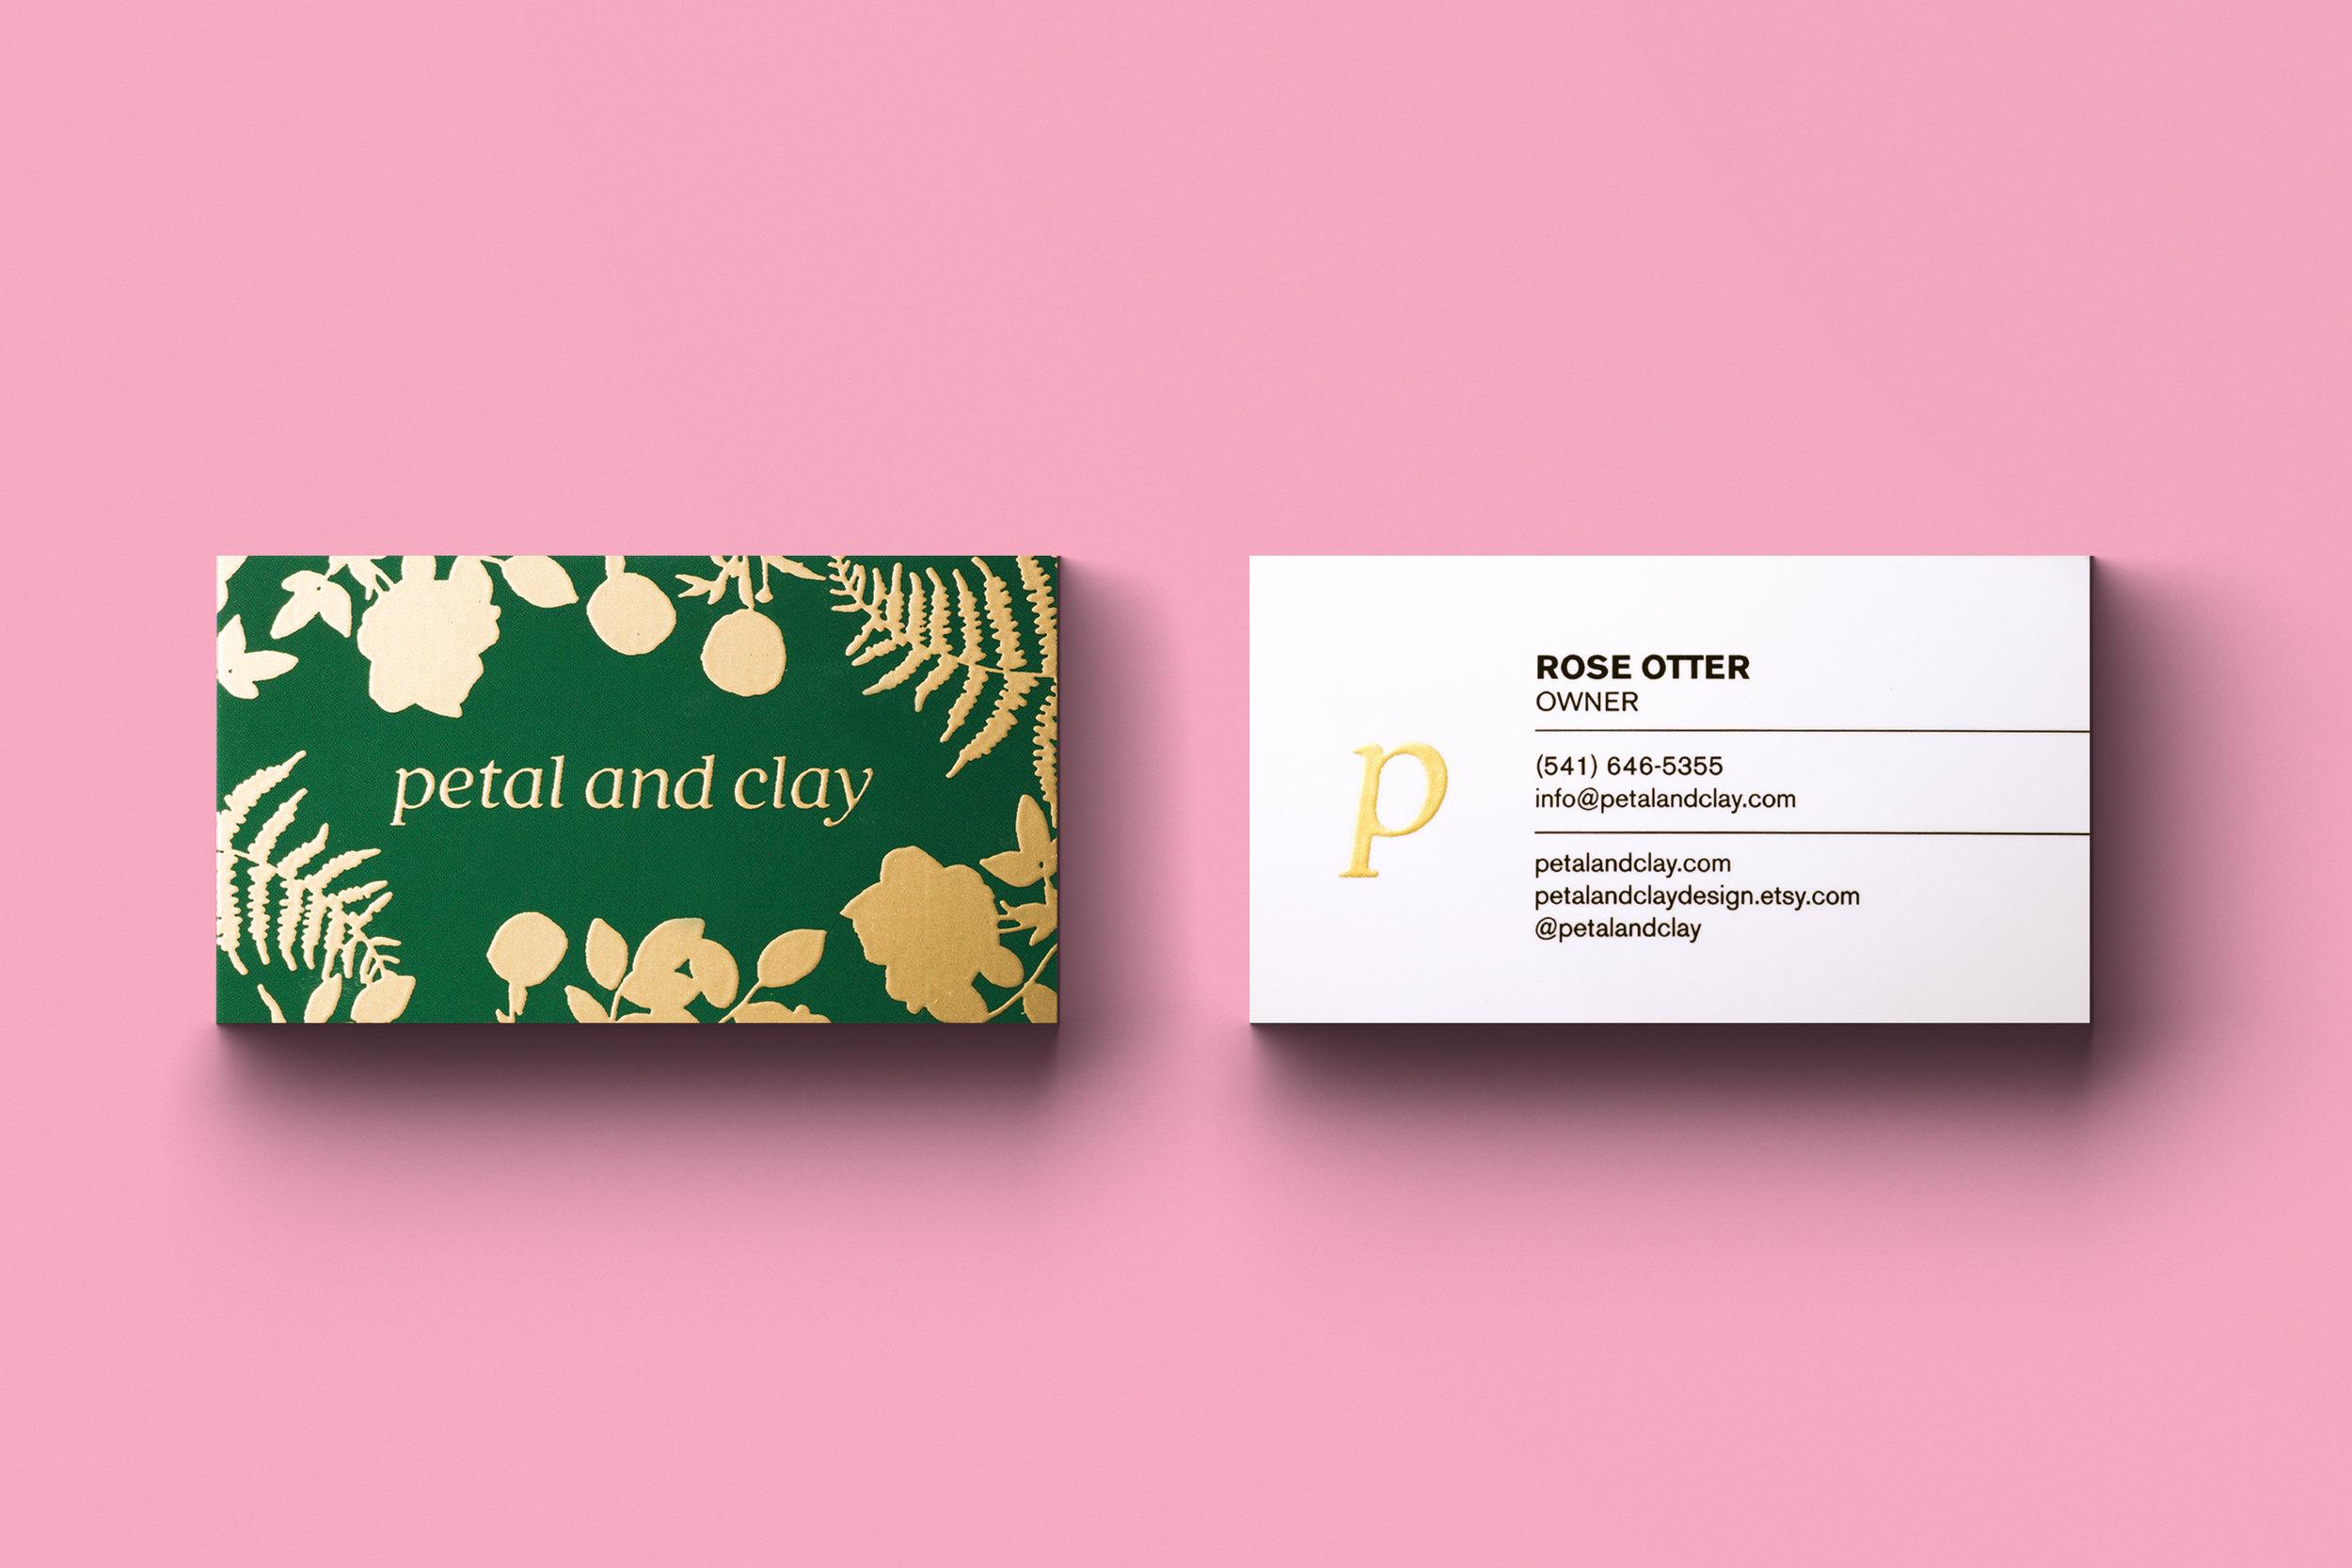 business card mockup_1.jpg